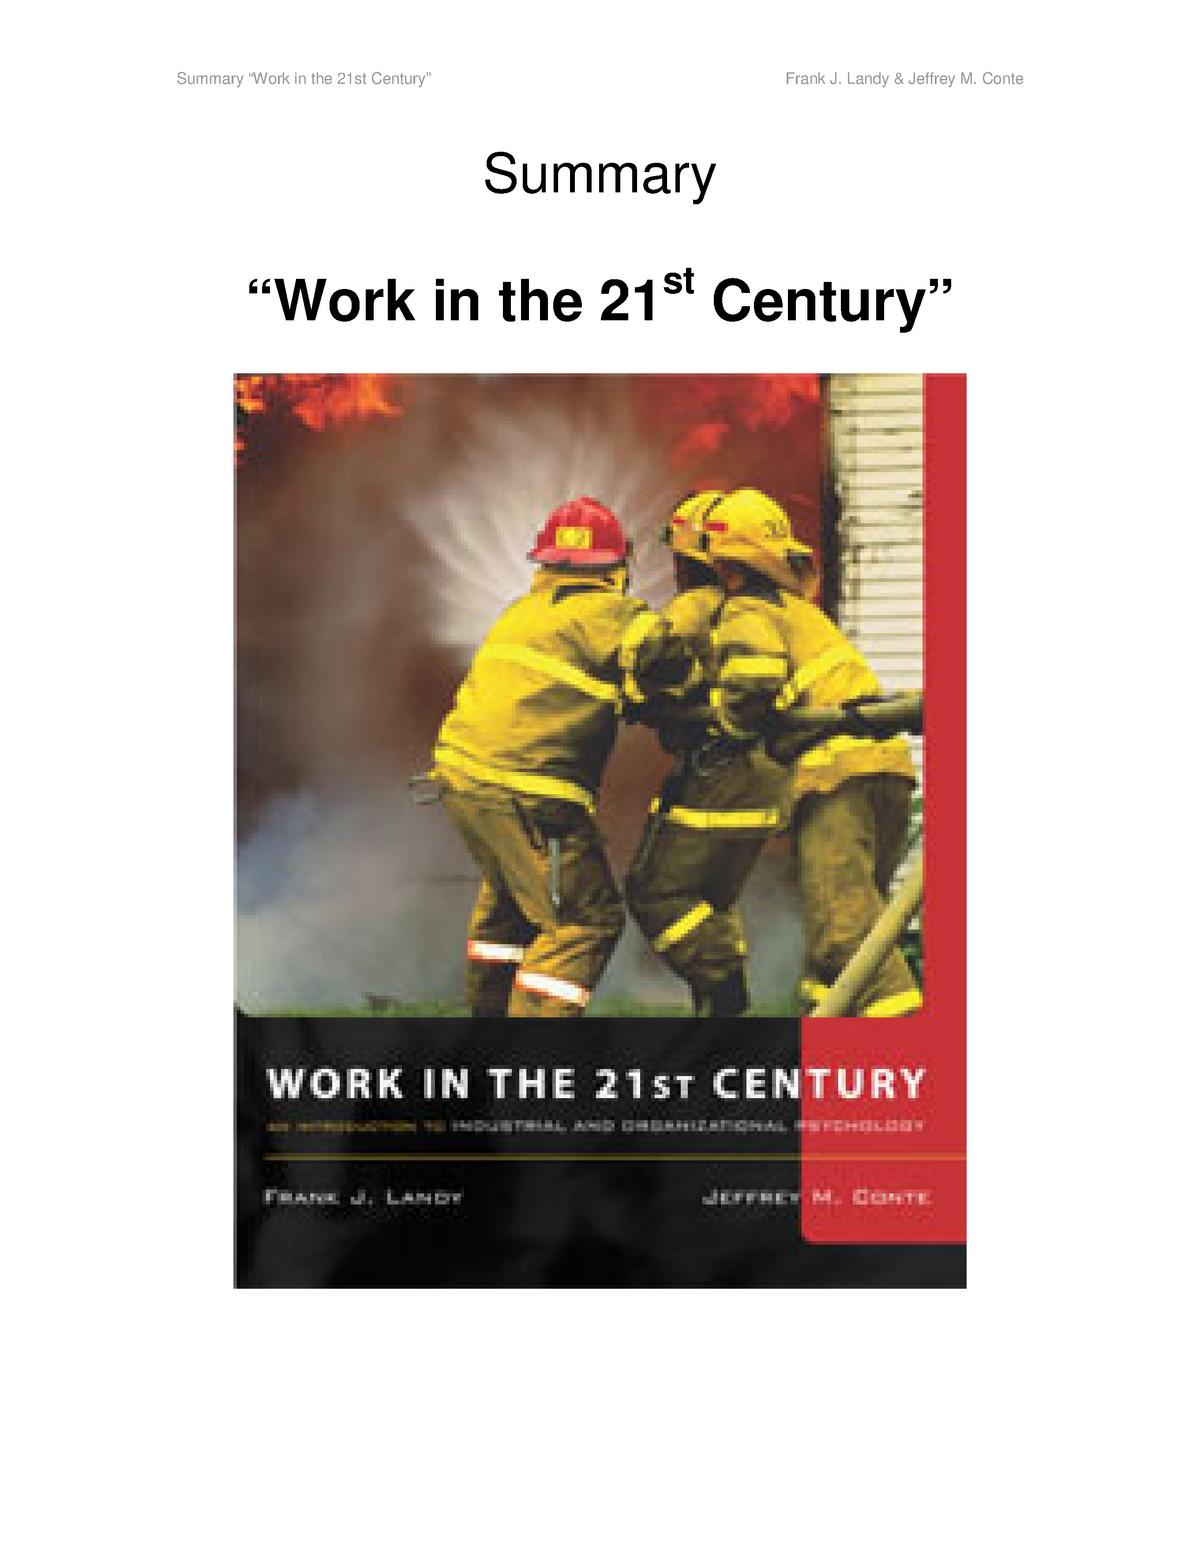 Summary Work in the 21st century, Frank J  Landy & Jeffrey - StuDocu